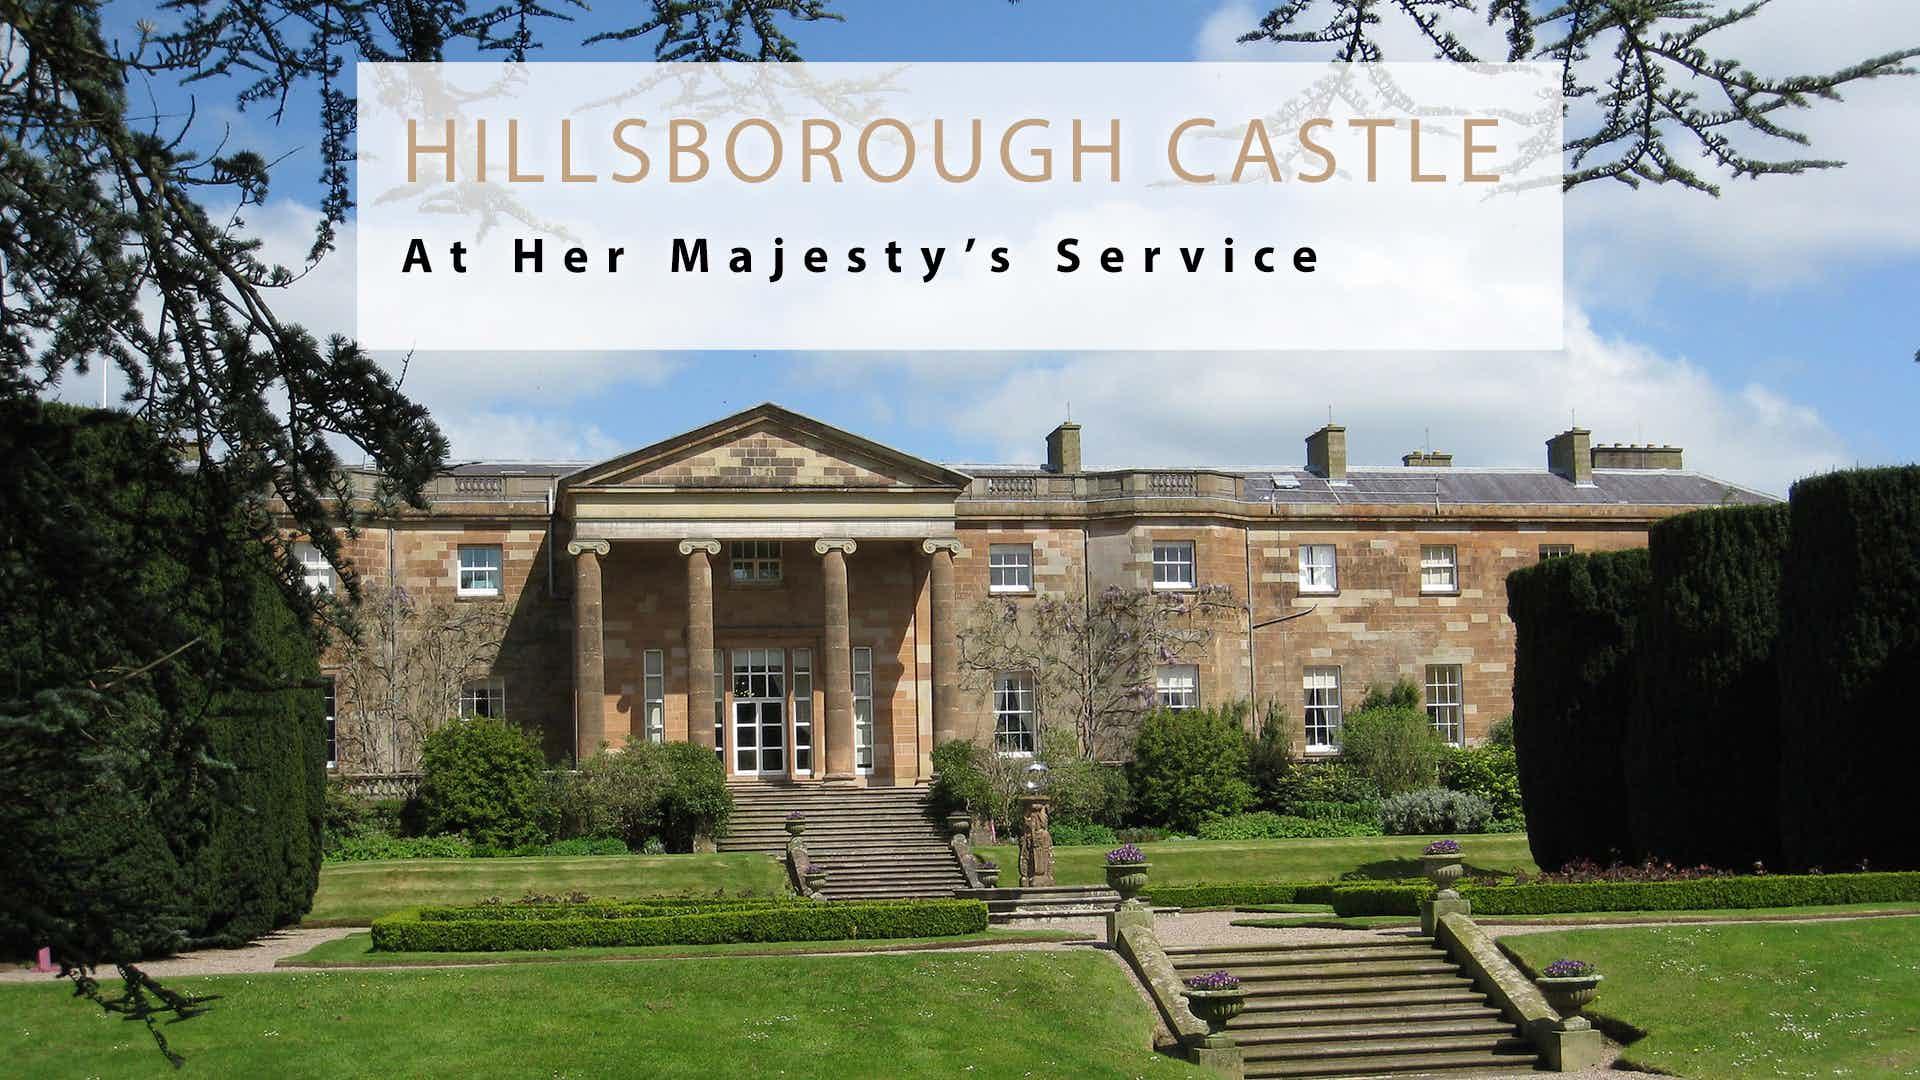 At Her Majesty's Service: Hillsborough Castle